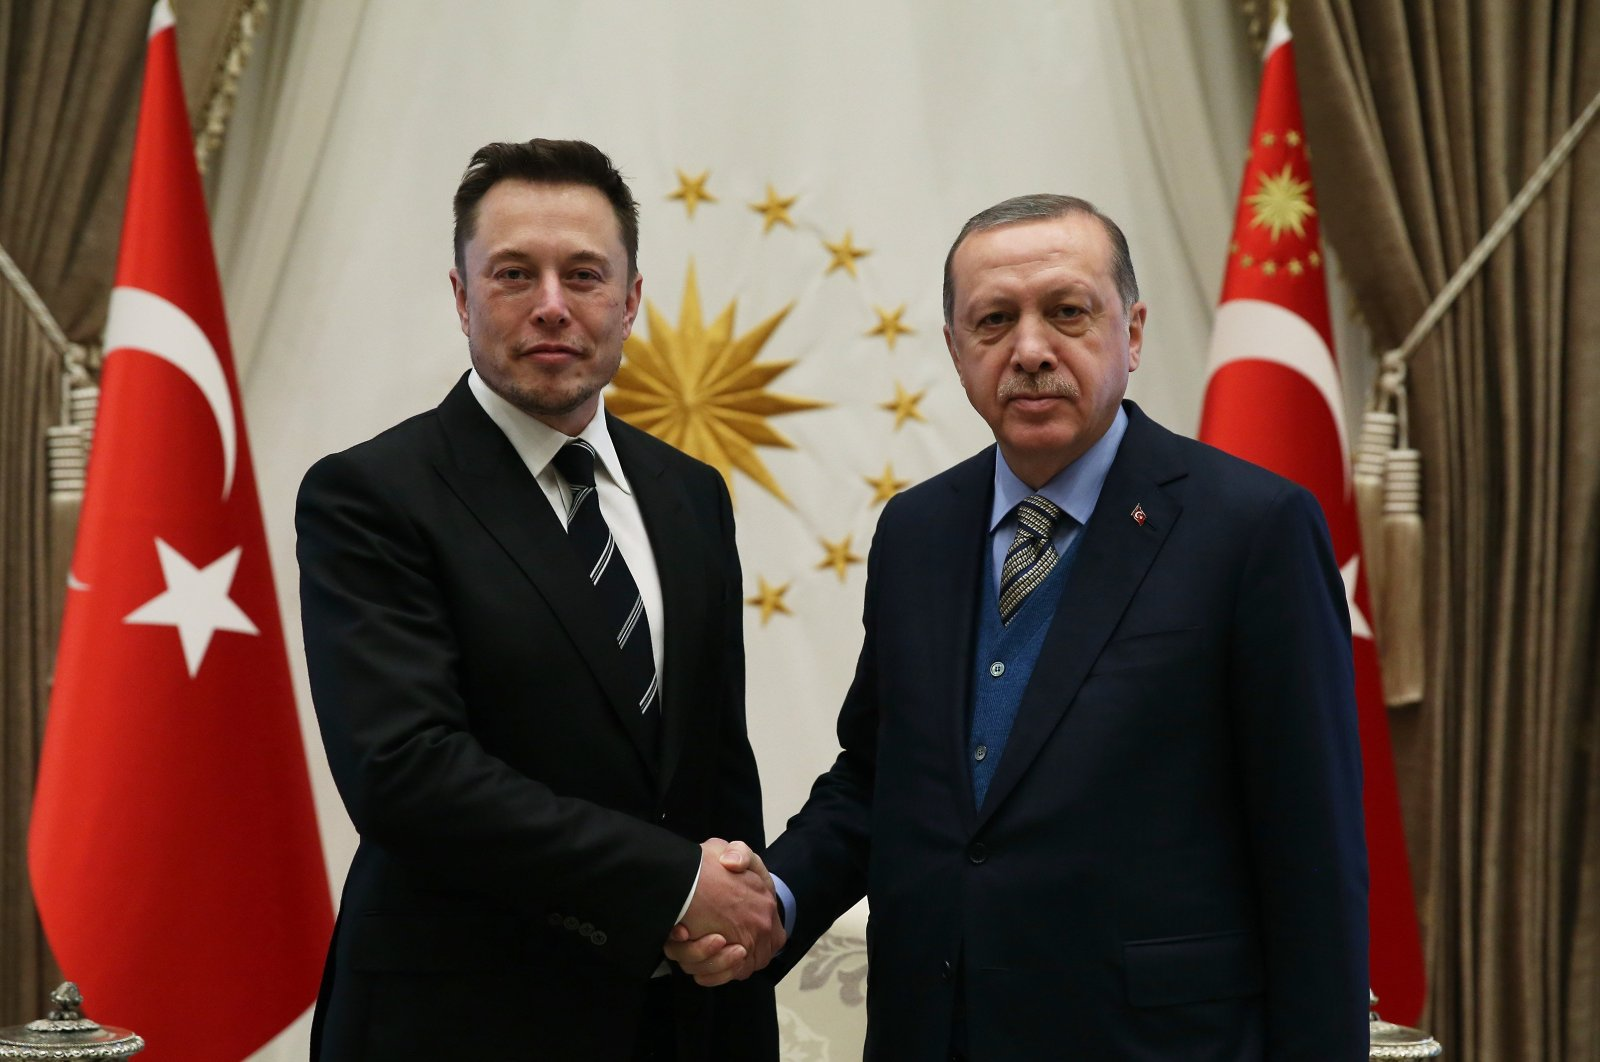 Tesla and SpaceX CEO Elon Musk (L) shakes hands with Turkish President Recep Tayyip Erdoğan during a visit, in Ankara, Turkey, Nov. 8, 2017. (IHA Photo)